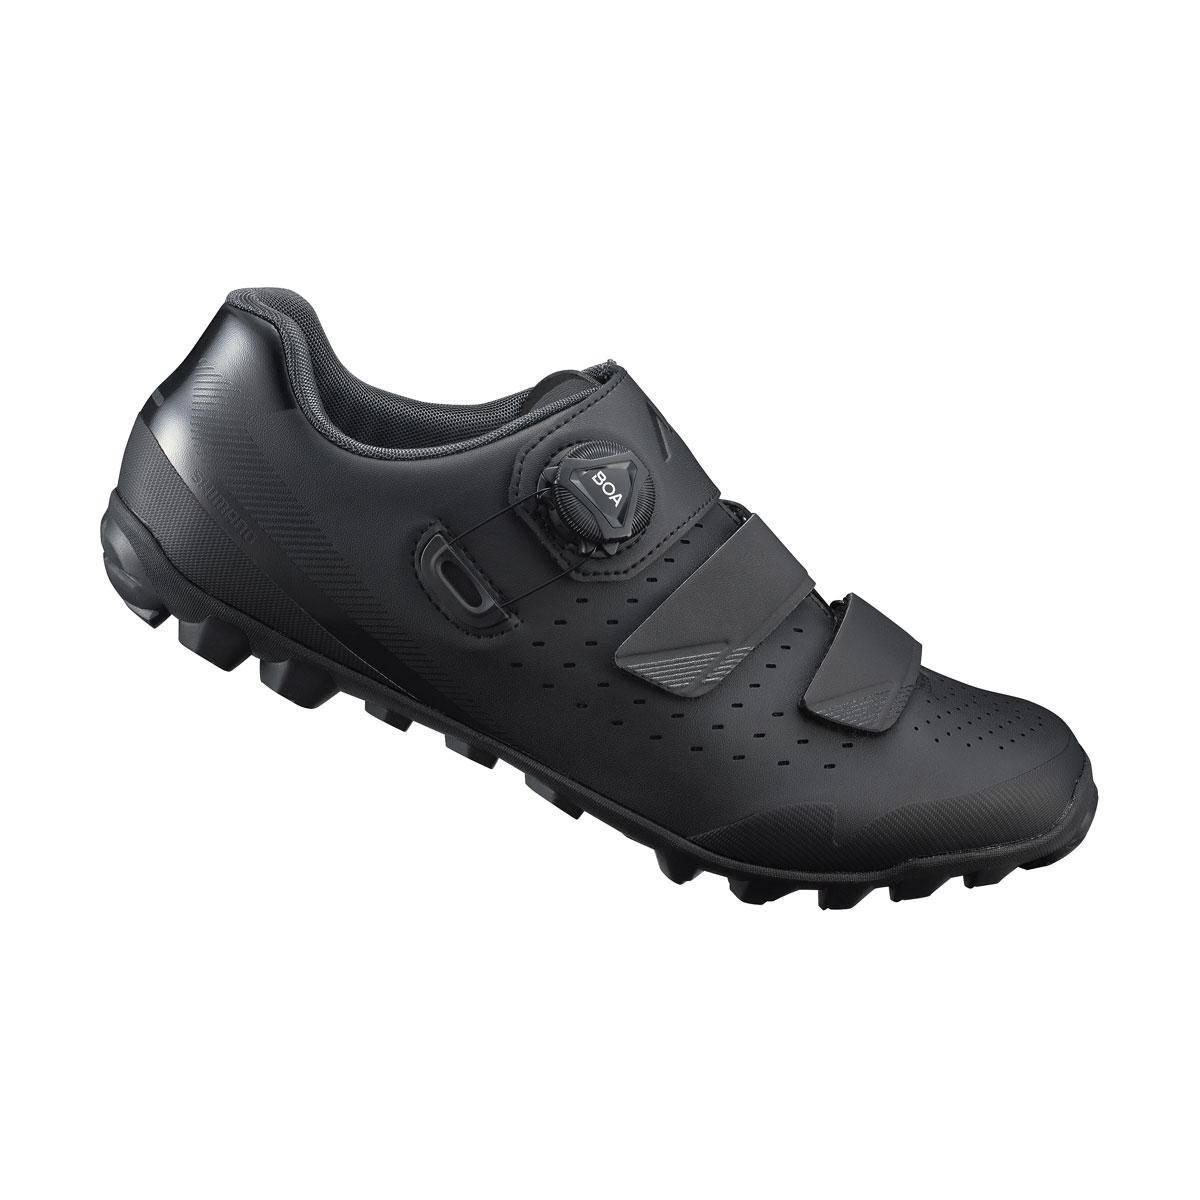 SHIMANO MTB obuv SH-ME400WL40, černá, 40